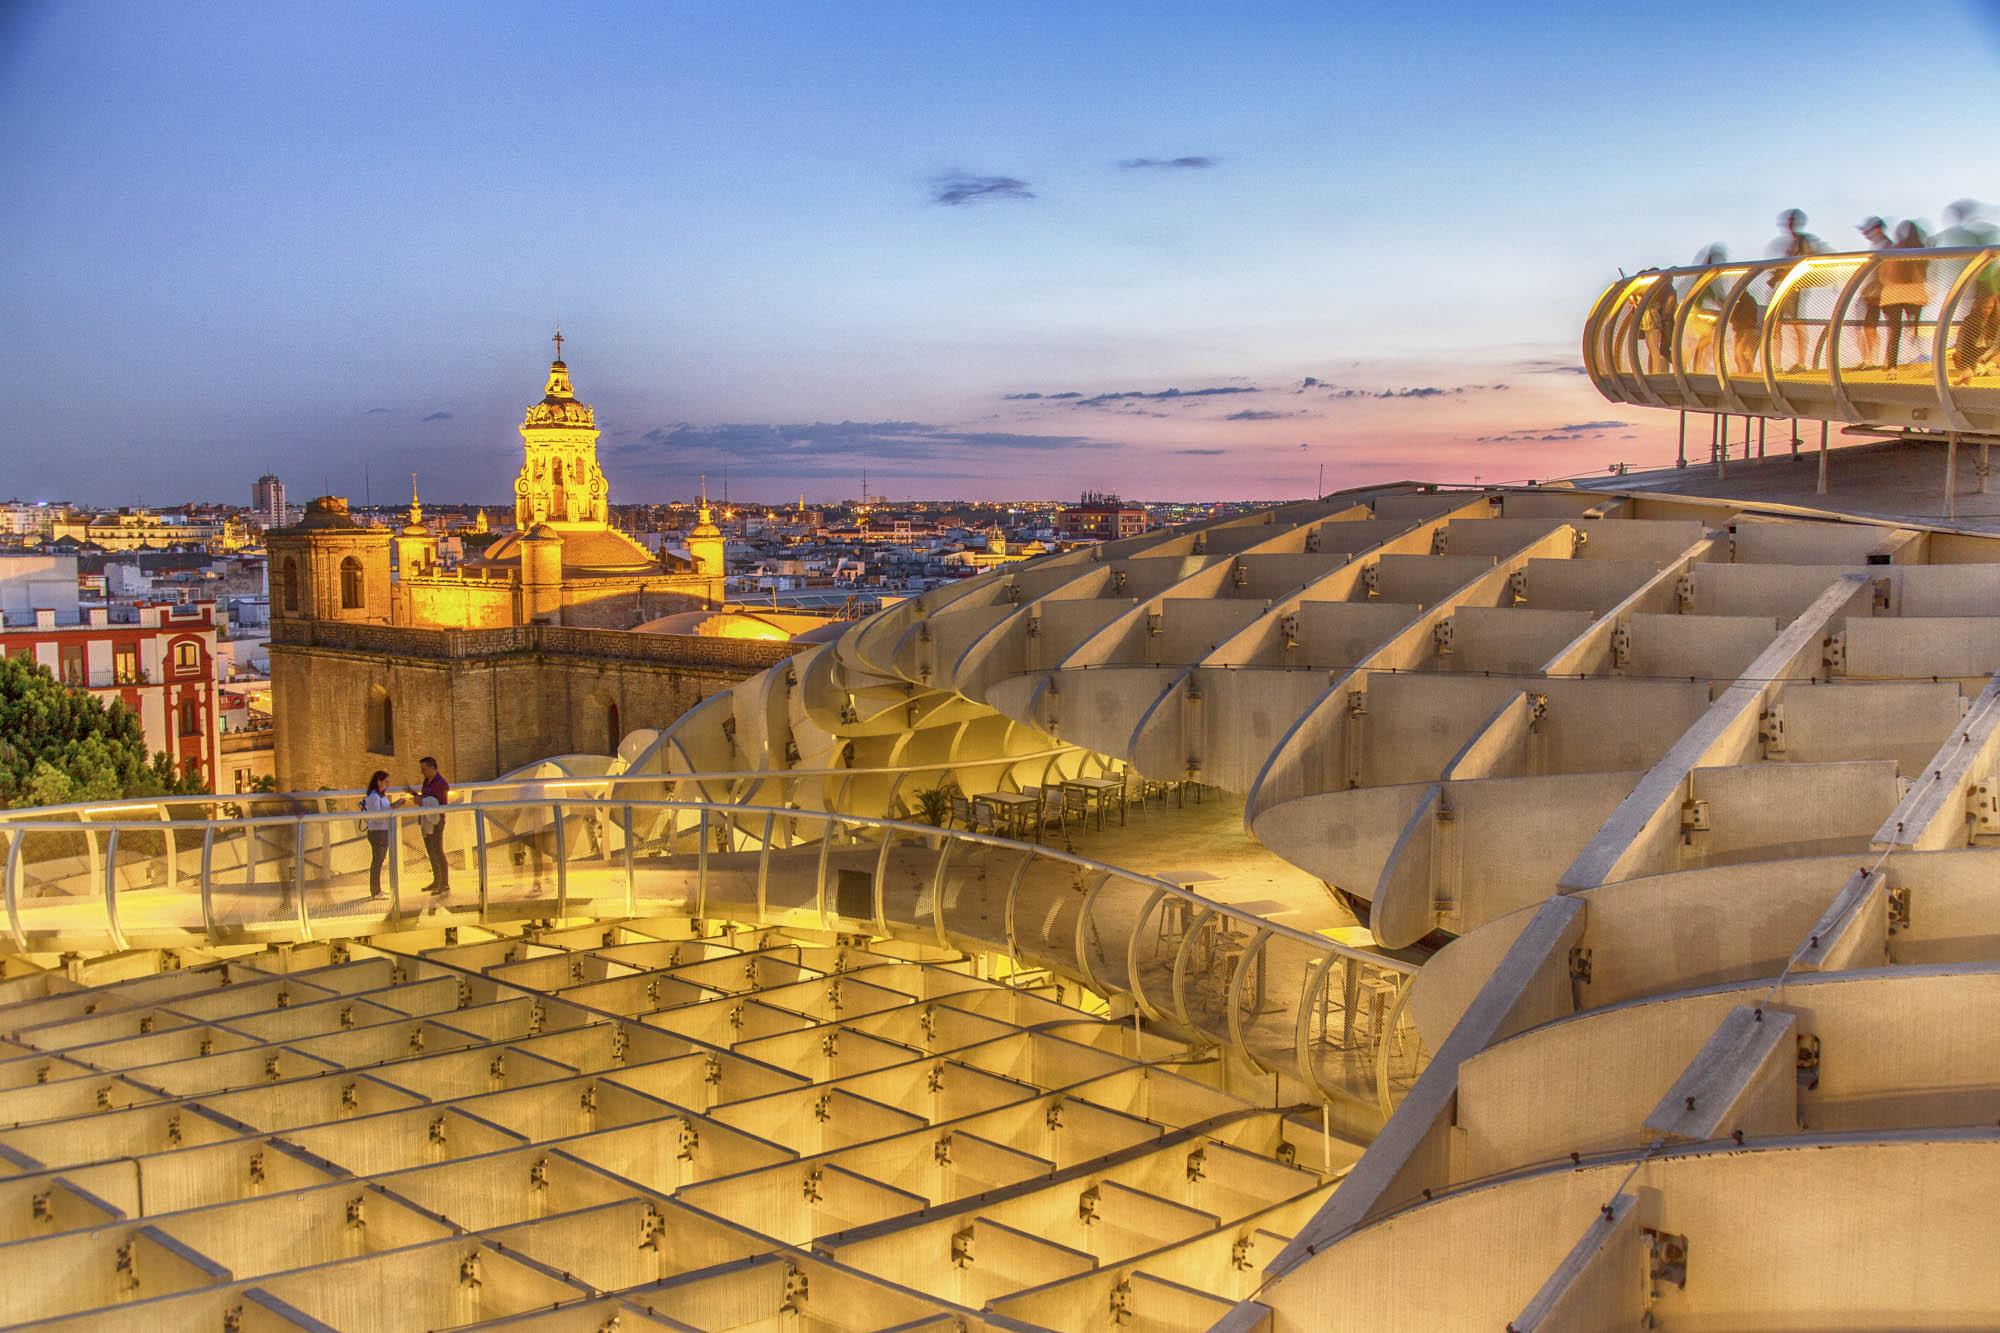 Spanien, Andalusien, Provinz Sevilla, Sevilla, Plaza de la Encarnacion, Aussichtsplatform auf dem Metropol Parasol. Architekt Jürgen Mayer H.